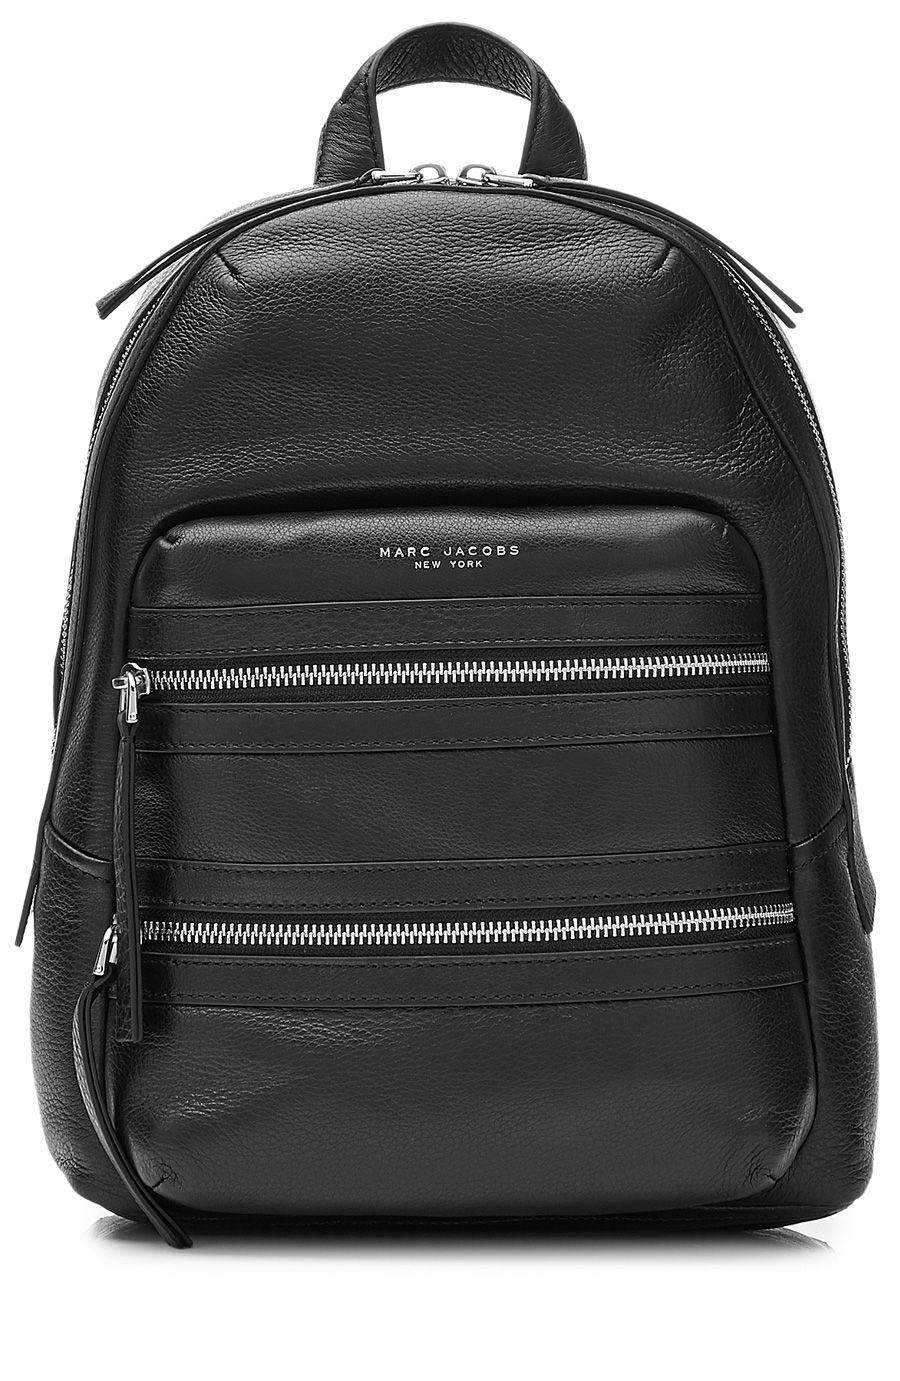 bf3edba0282f MARC JACOBS Leather Biker Backpack.  marcjacobs  bags  leather  lining   denim  backpacks